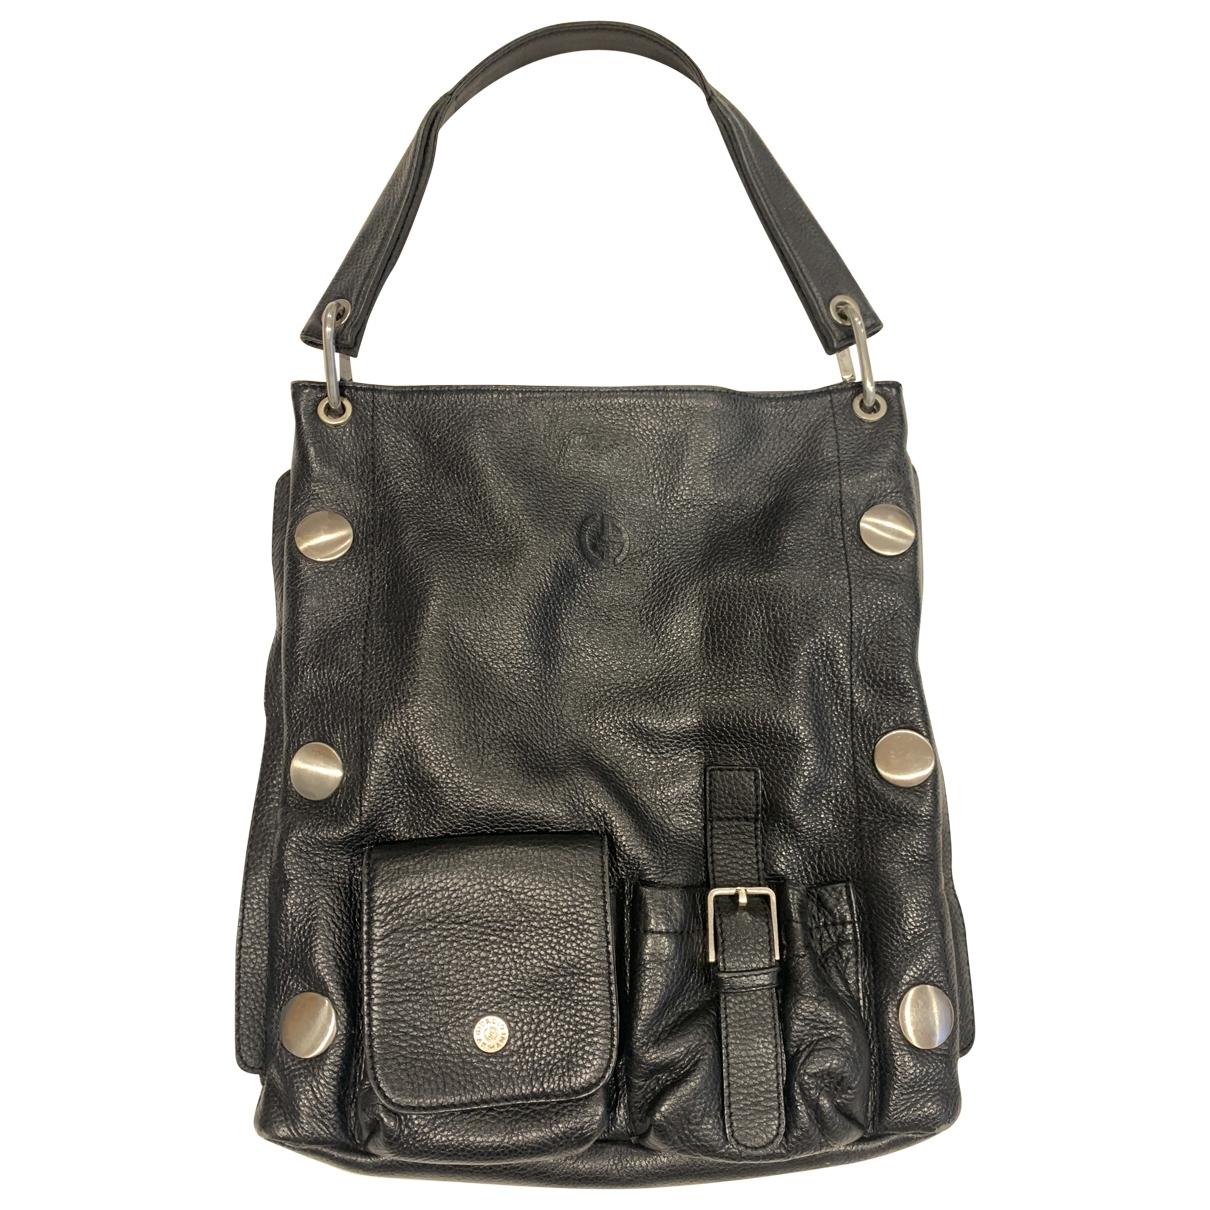 Giorgio Armani \N Black Leather handbag for Women \N